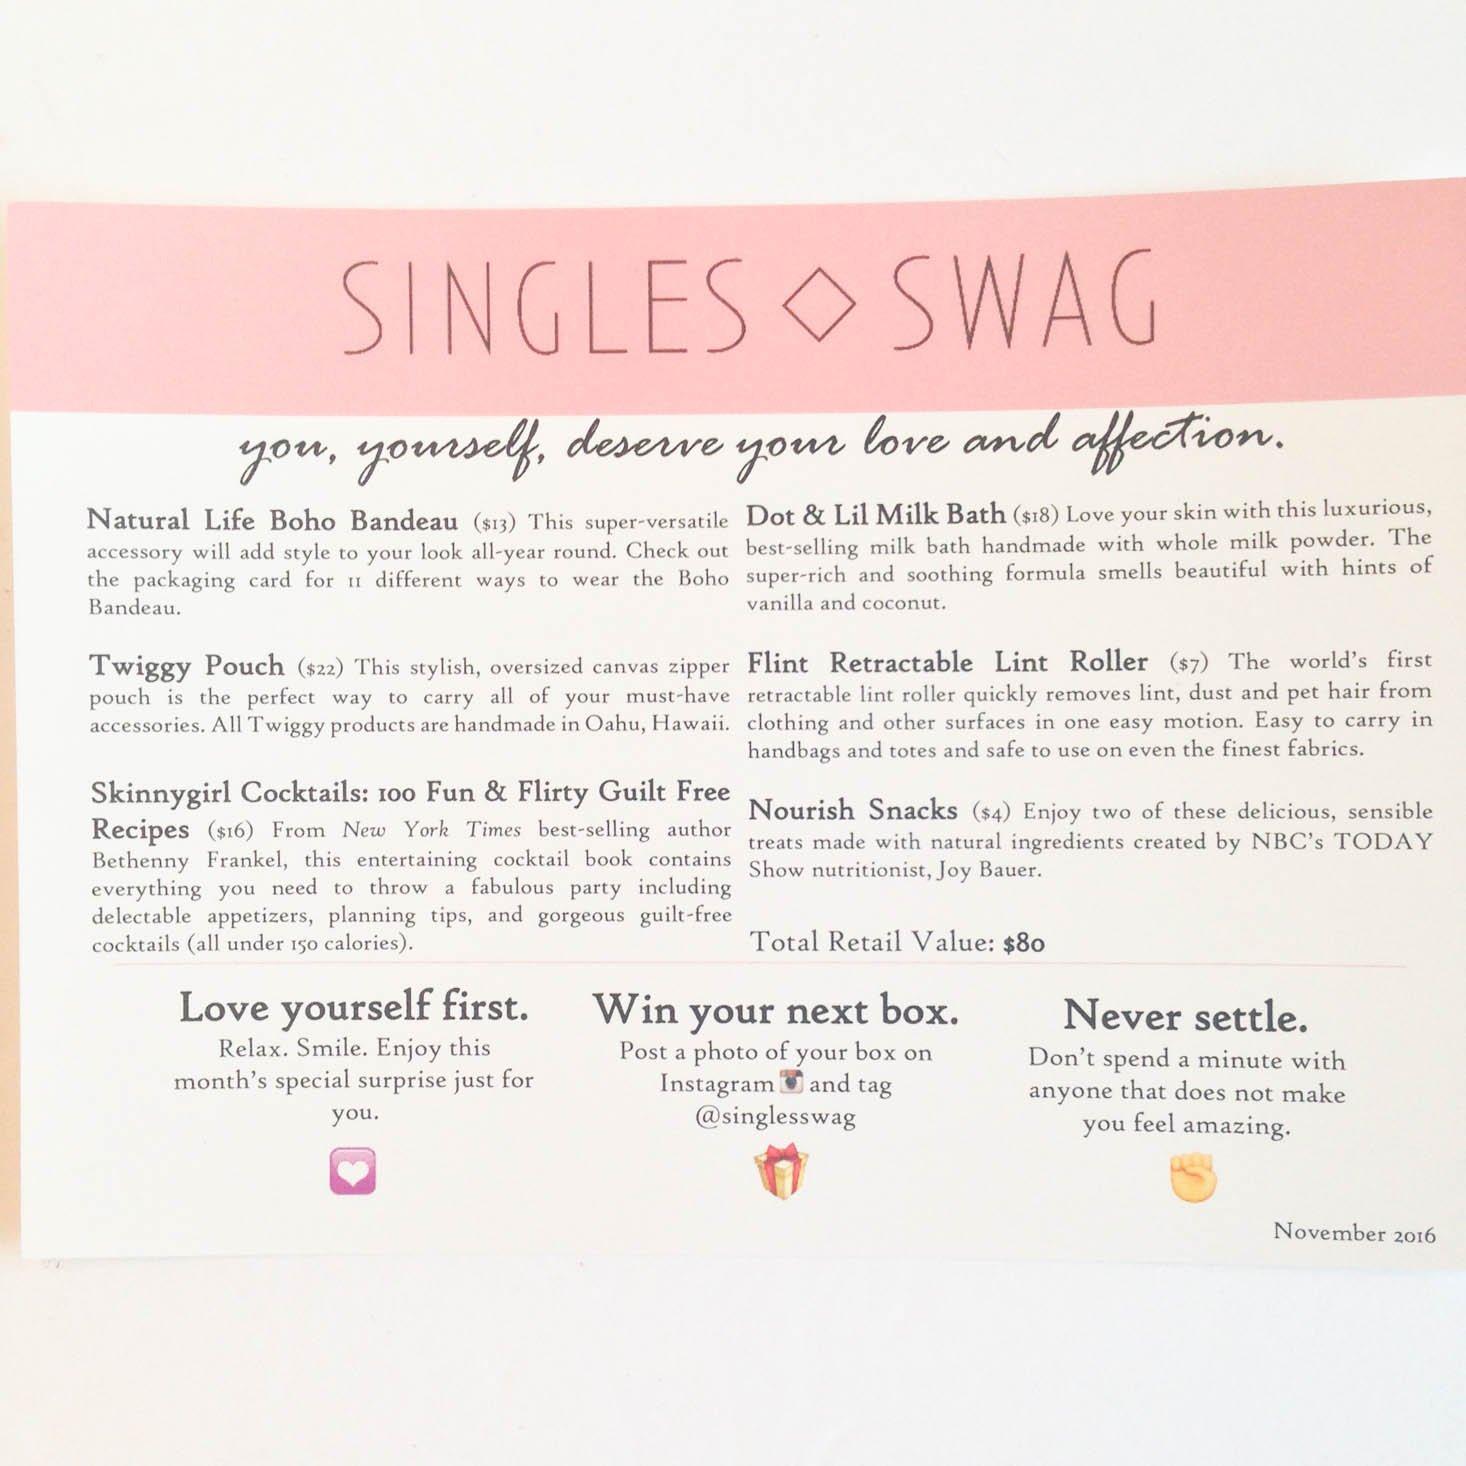 singlesswag-november-2016-booklet